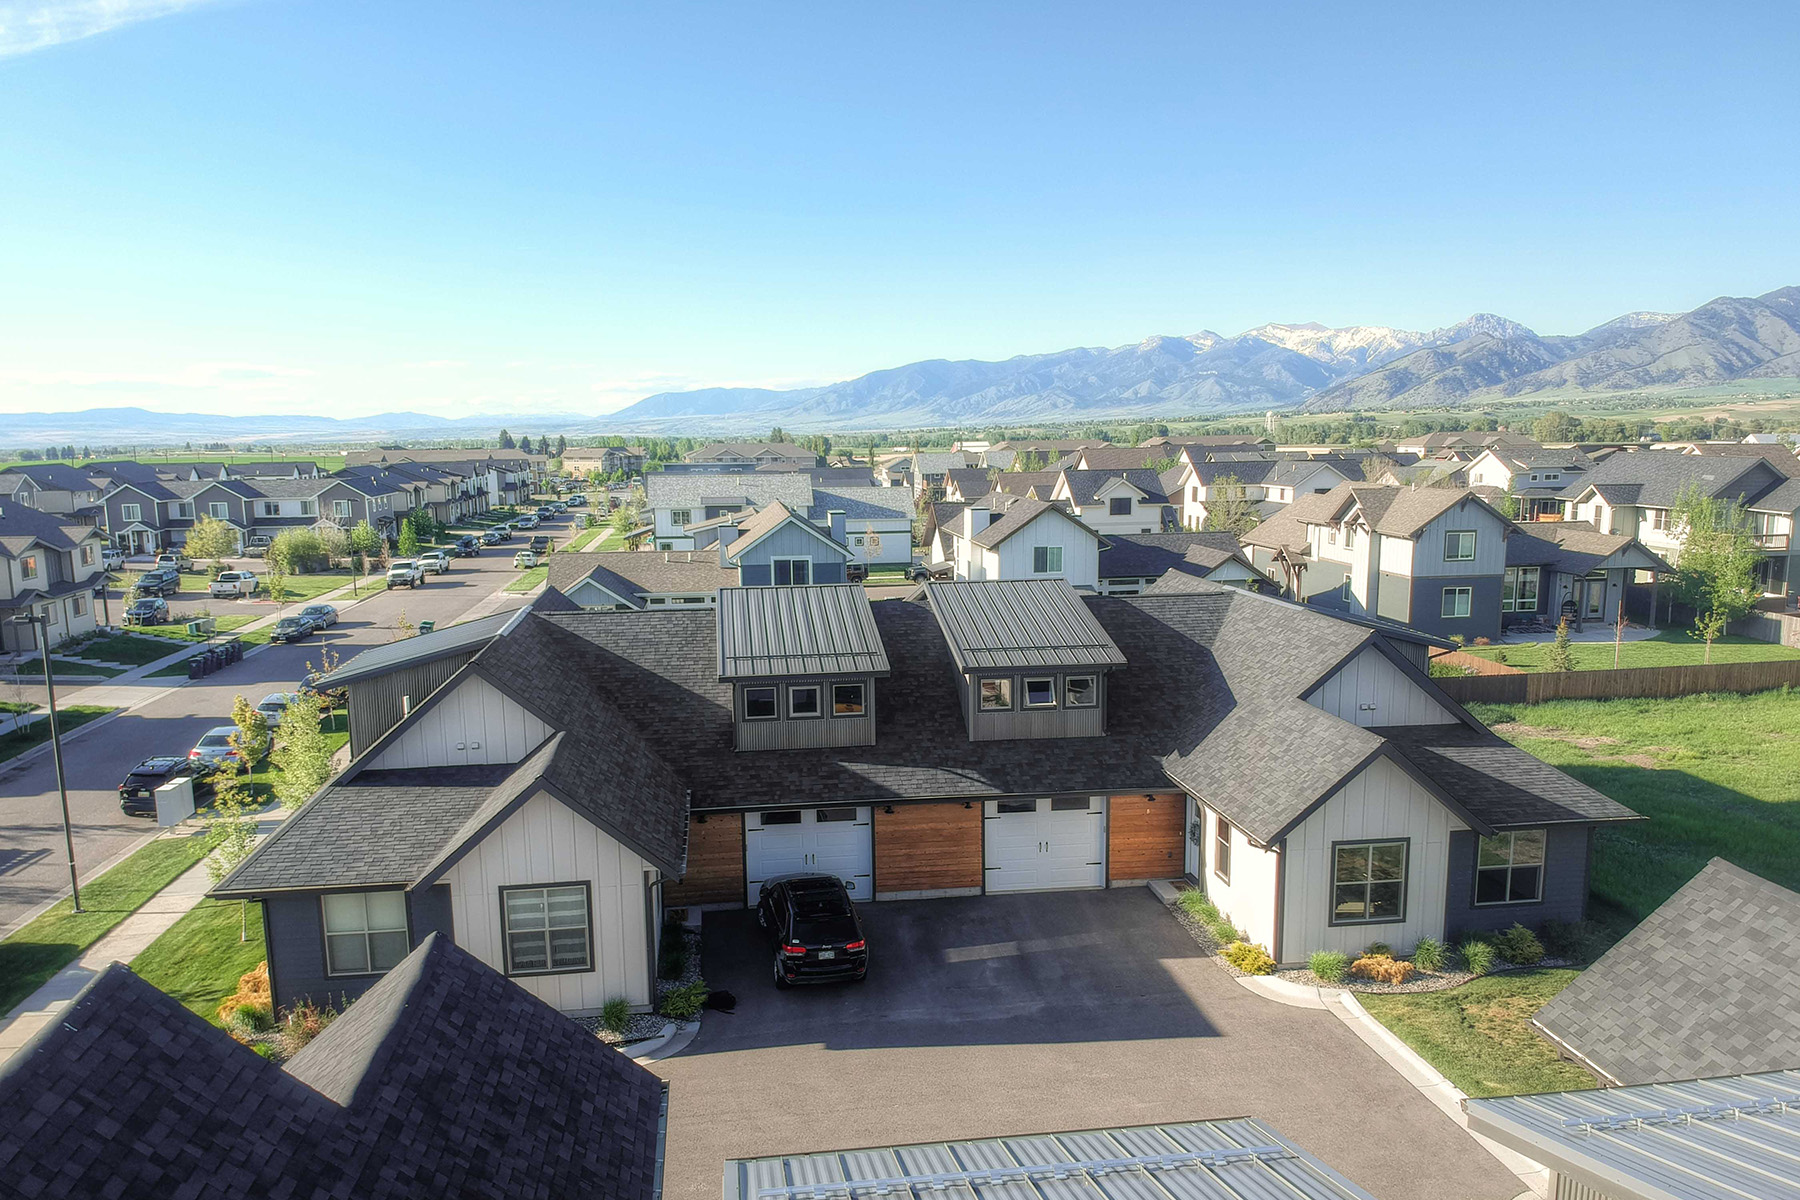 Condominiums for Sale at 3194 Fen Way Unit B Bozeman, Montana 59718 United States